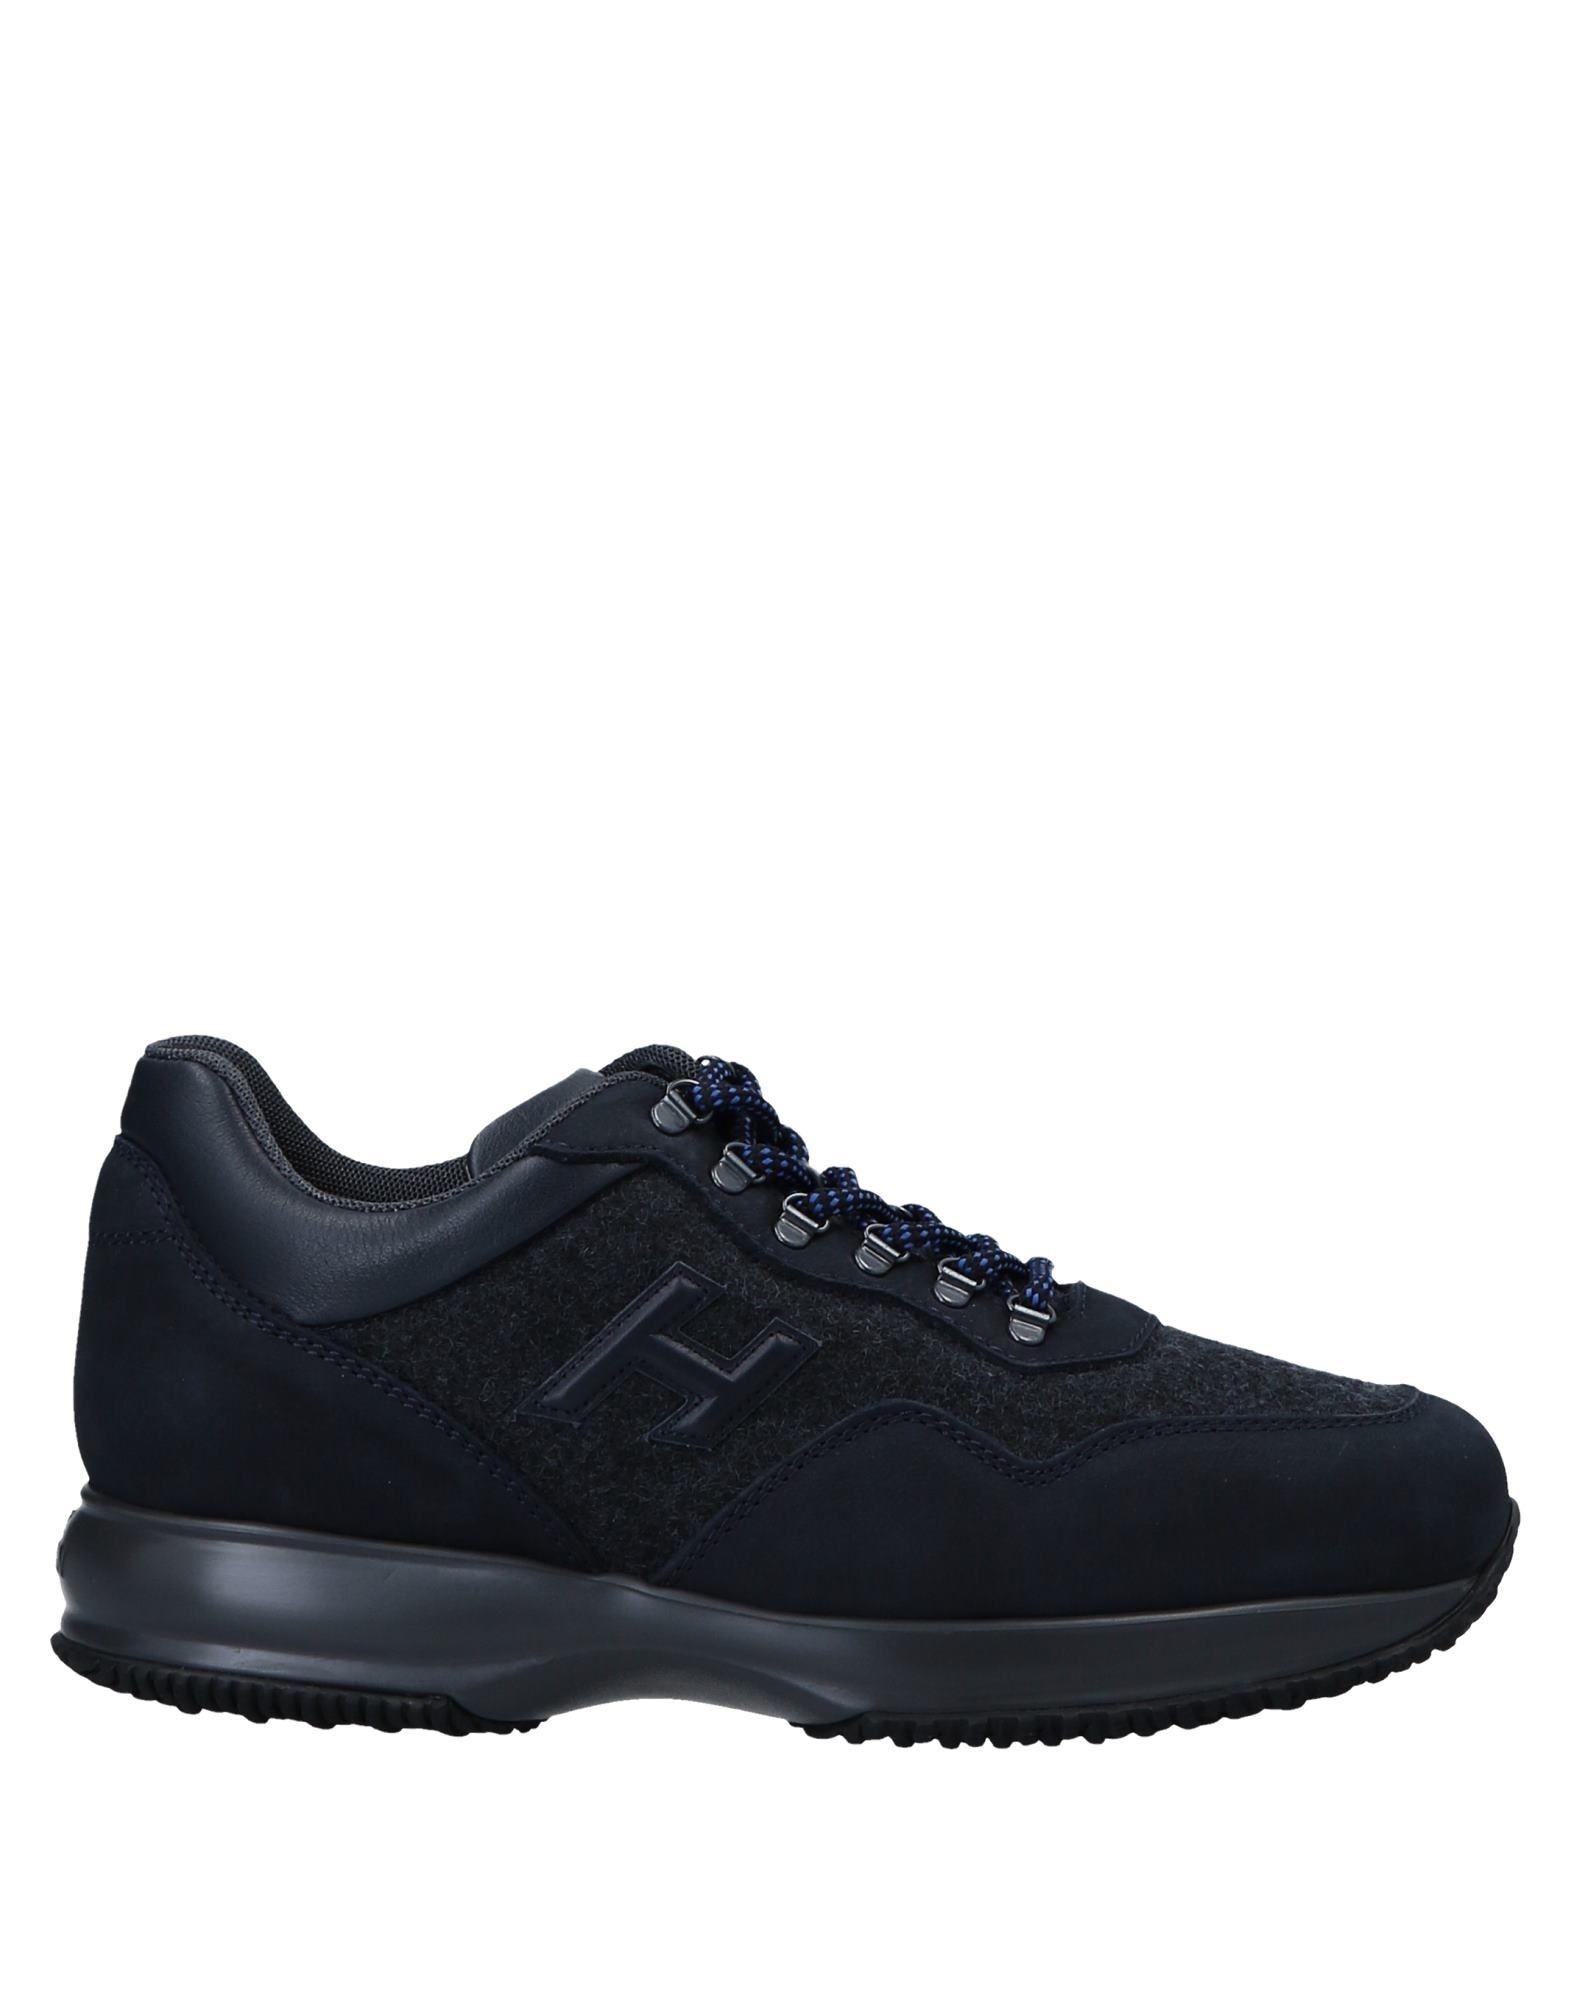 Hogan Sneakers Herren  11559814RD Gute Qualität beliebte Schuhe